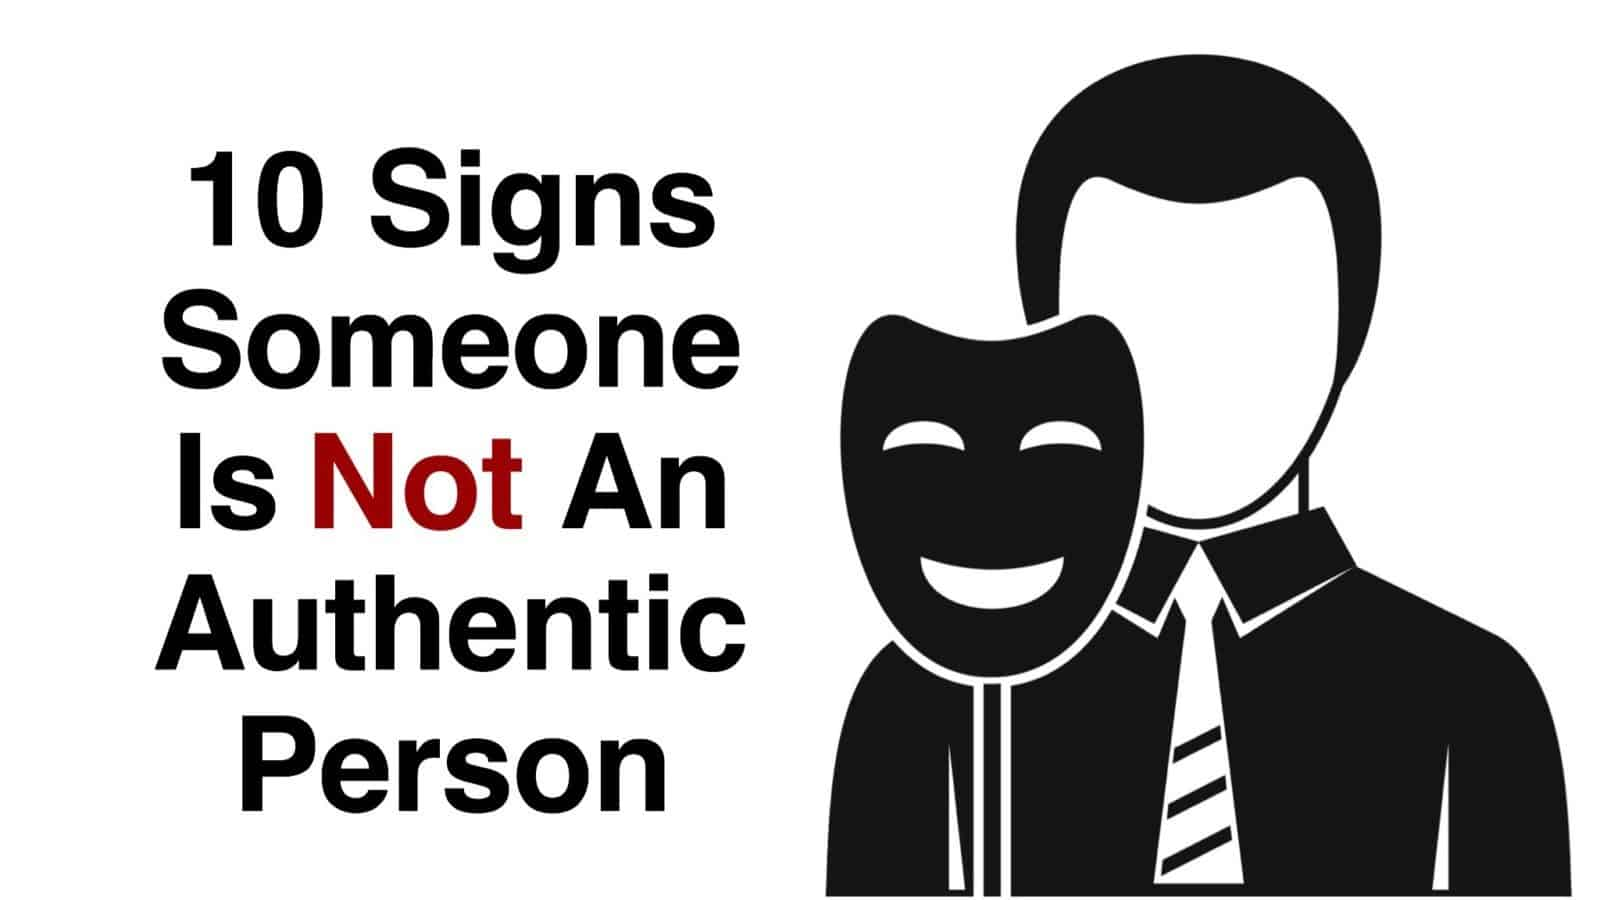 authentic person